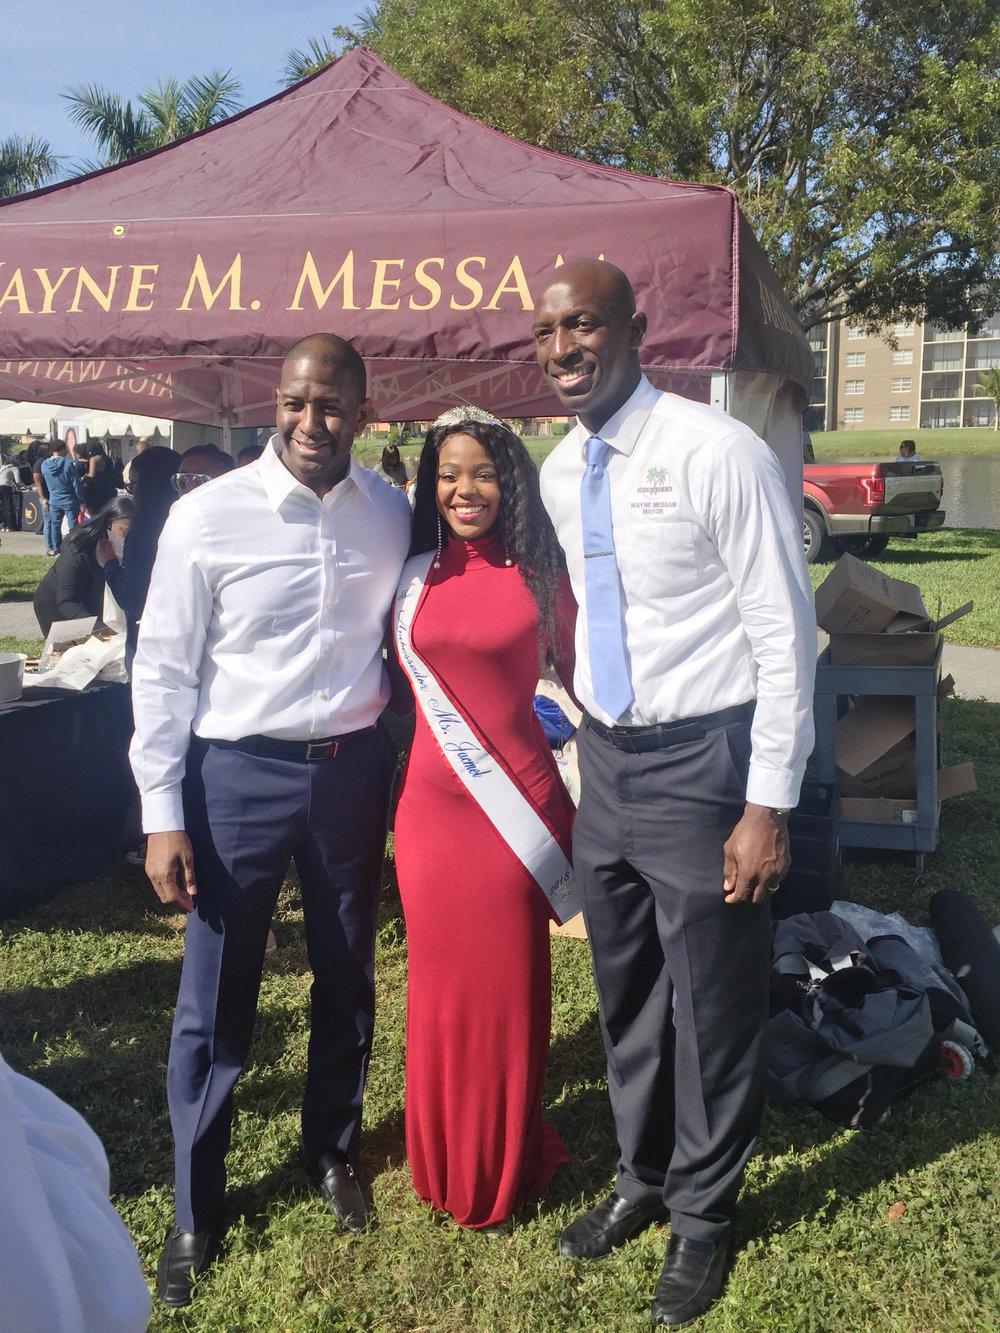 Ms. Jacmel with the Mayor of Miramar, Florida